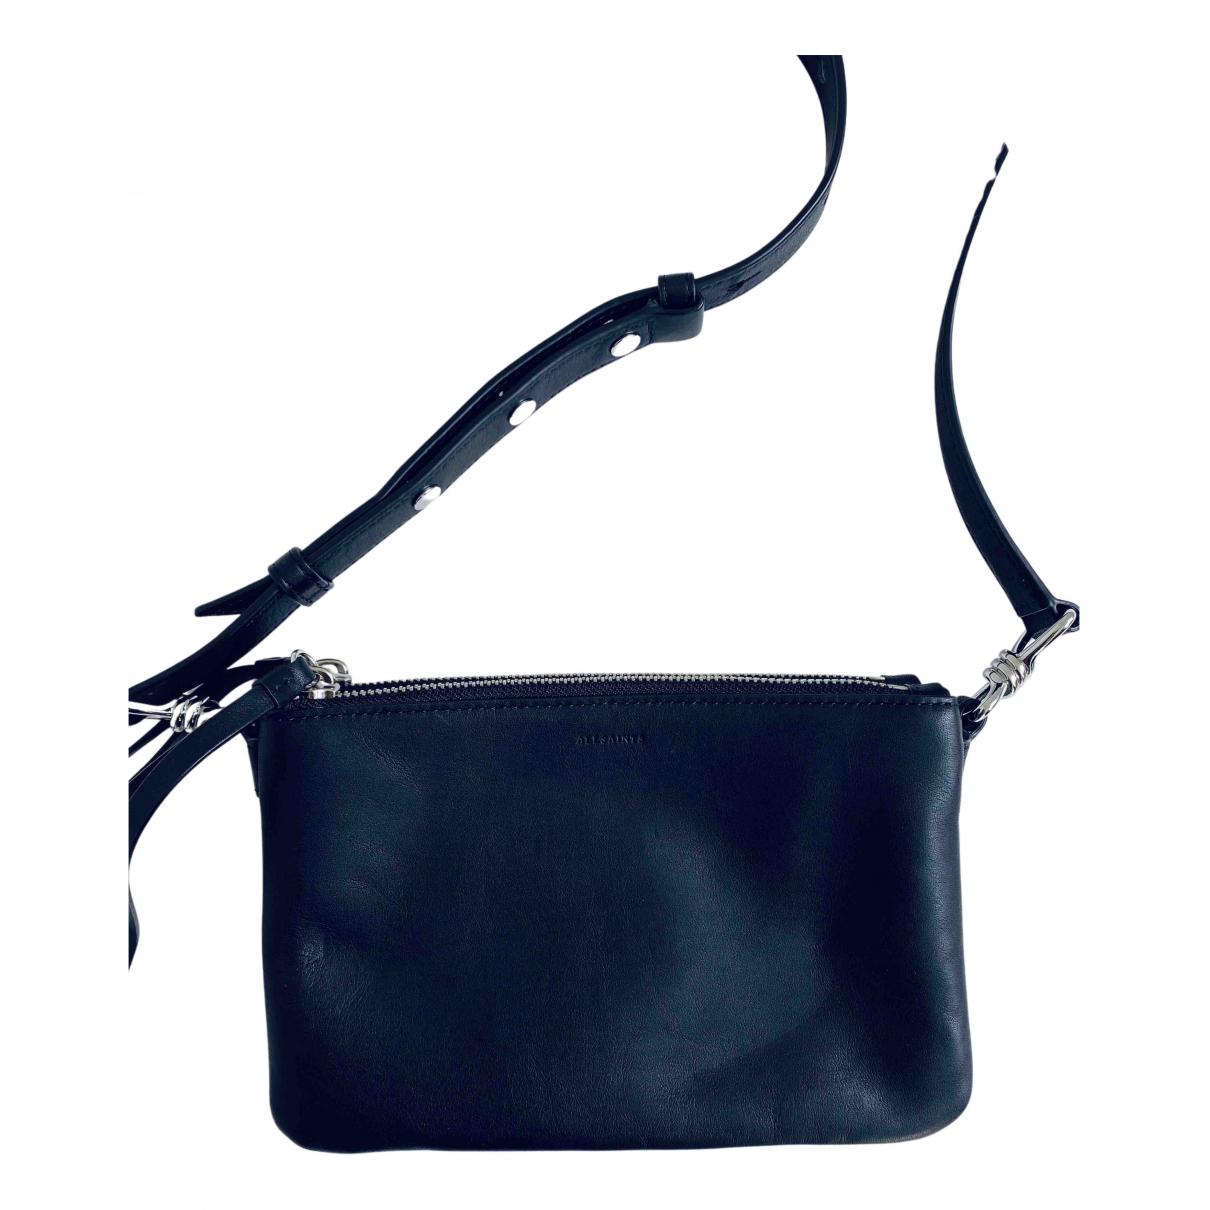 All Saints N Black Leather handbag for Women N